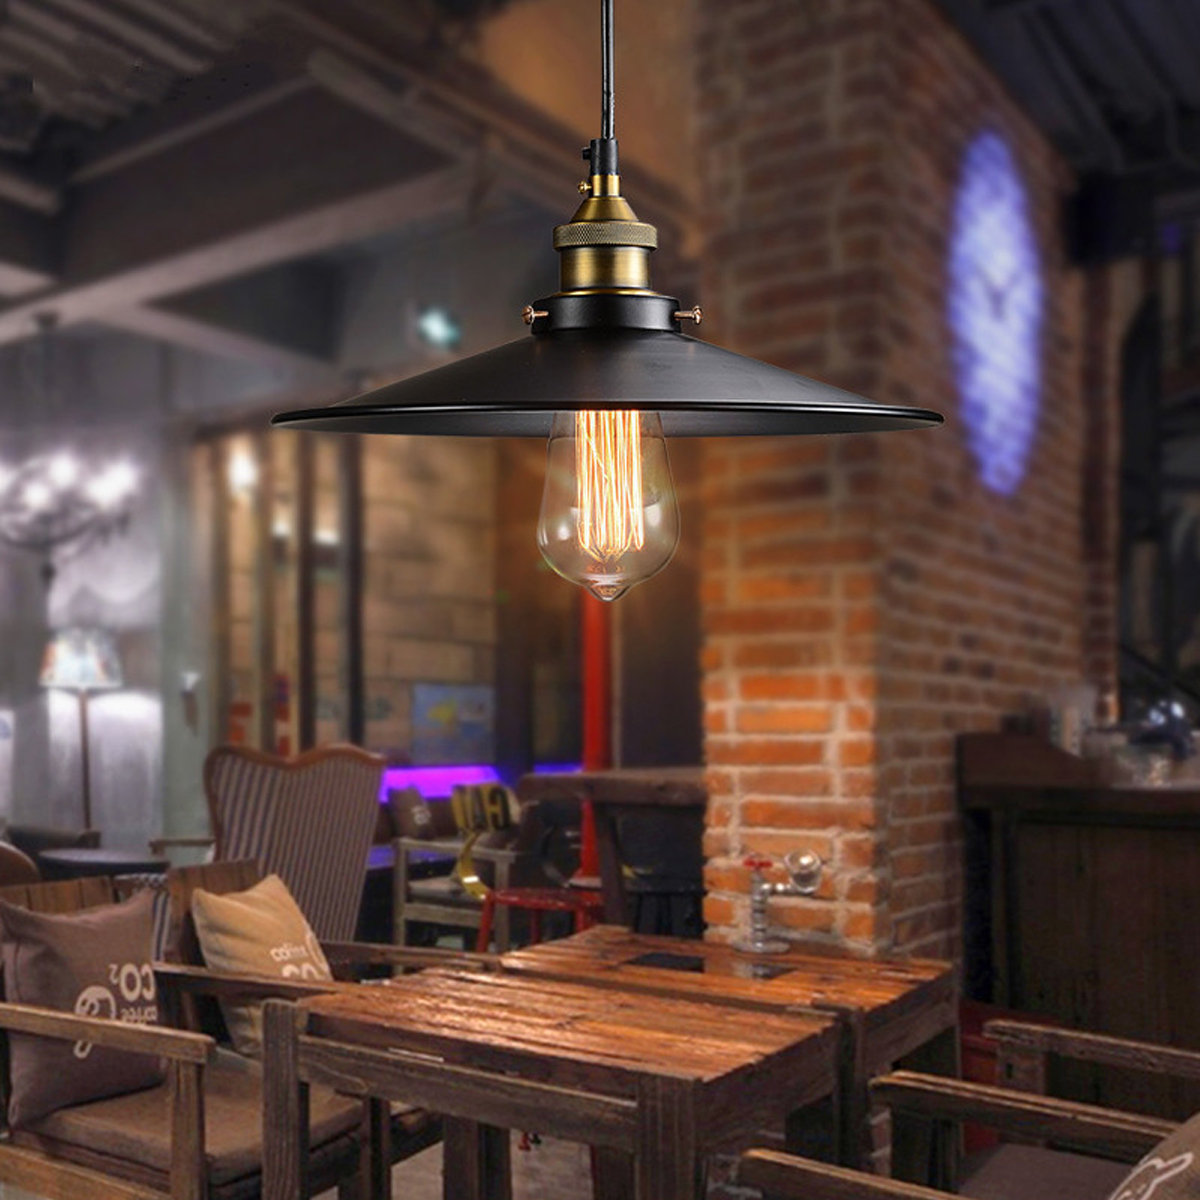 26cm Loft Vintage Ceiling Lamp Retro Industrial Chandelier Fixture For Cafe Restaurant Bar American Style Metal Light